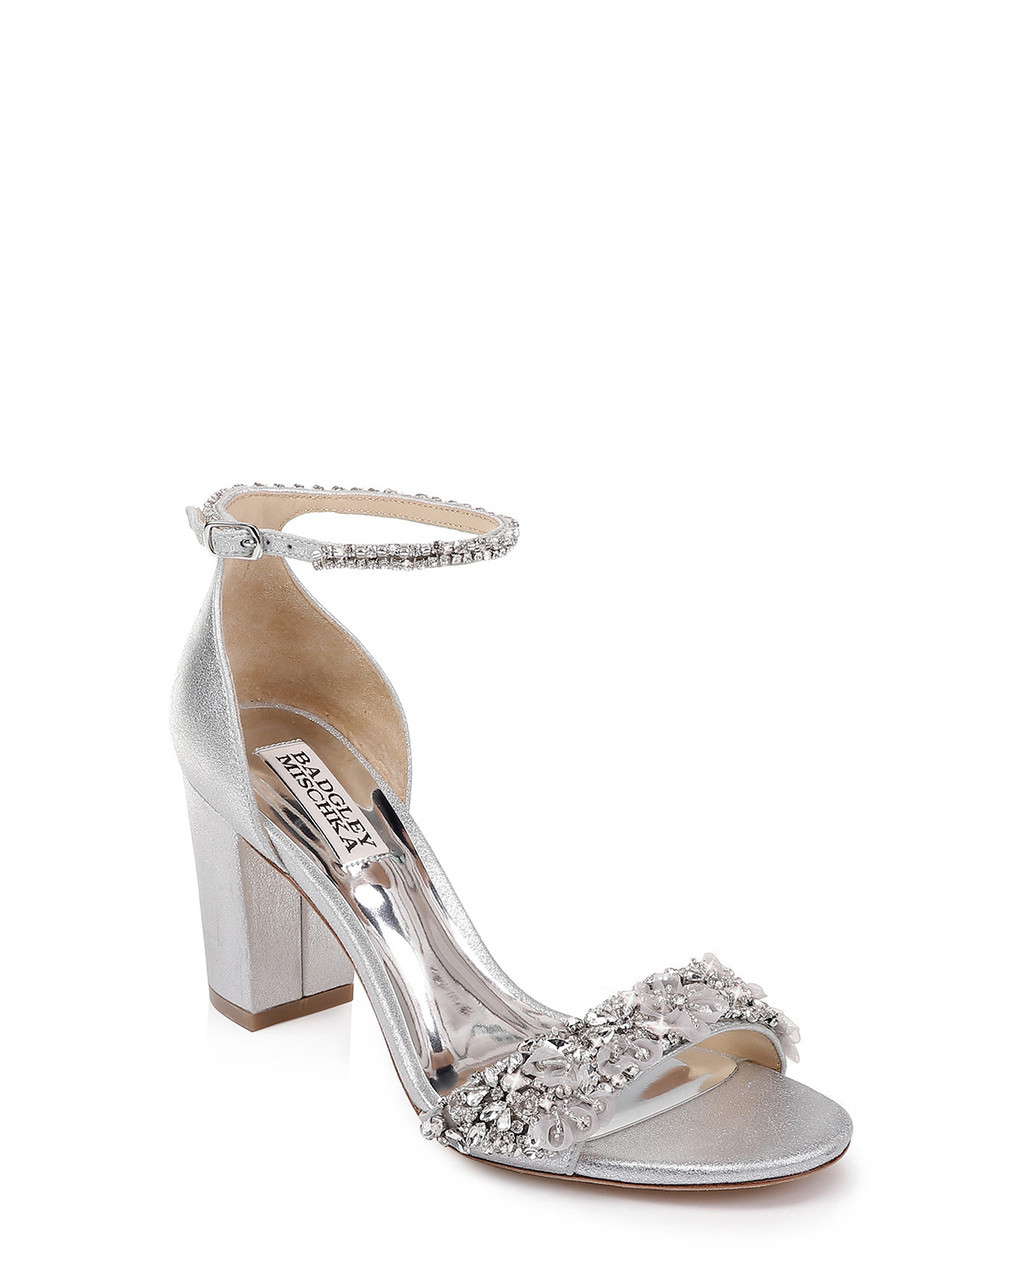 3ba2f2307 Finesse II Ankle Strap Evening Shoe by Badgley Mischka